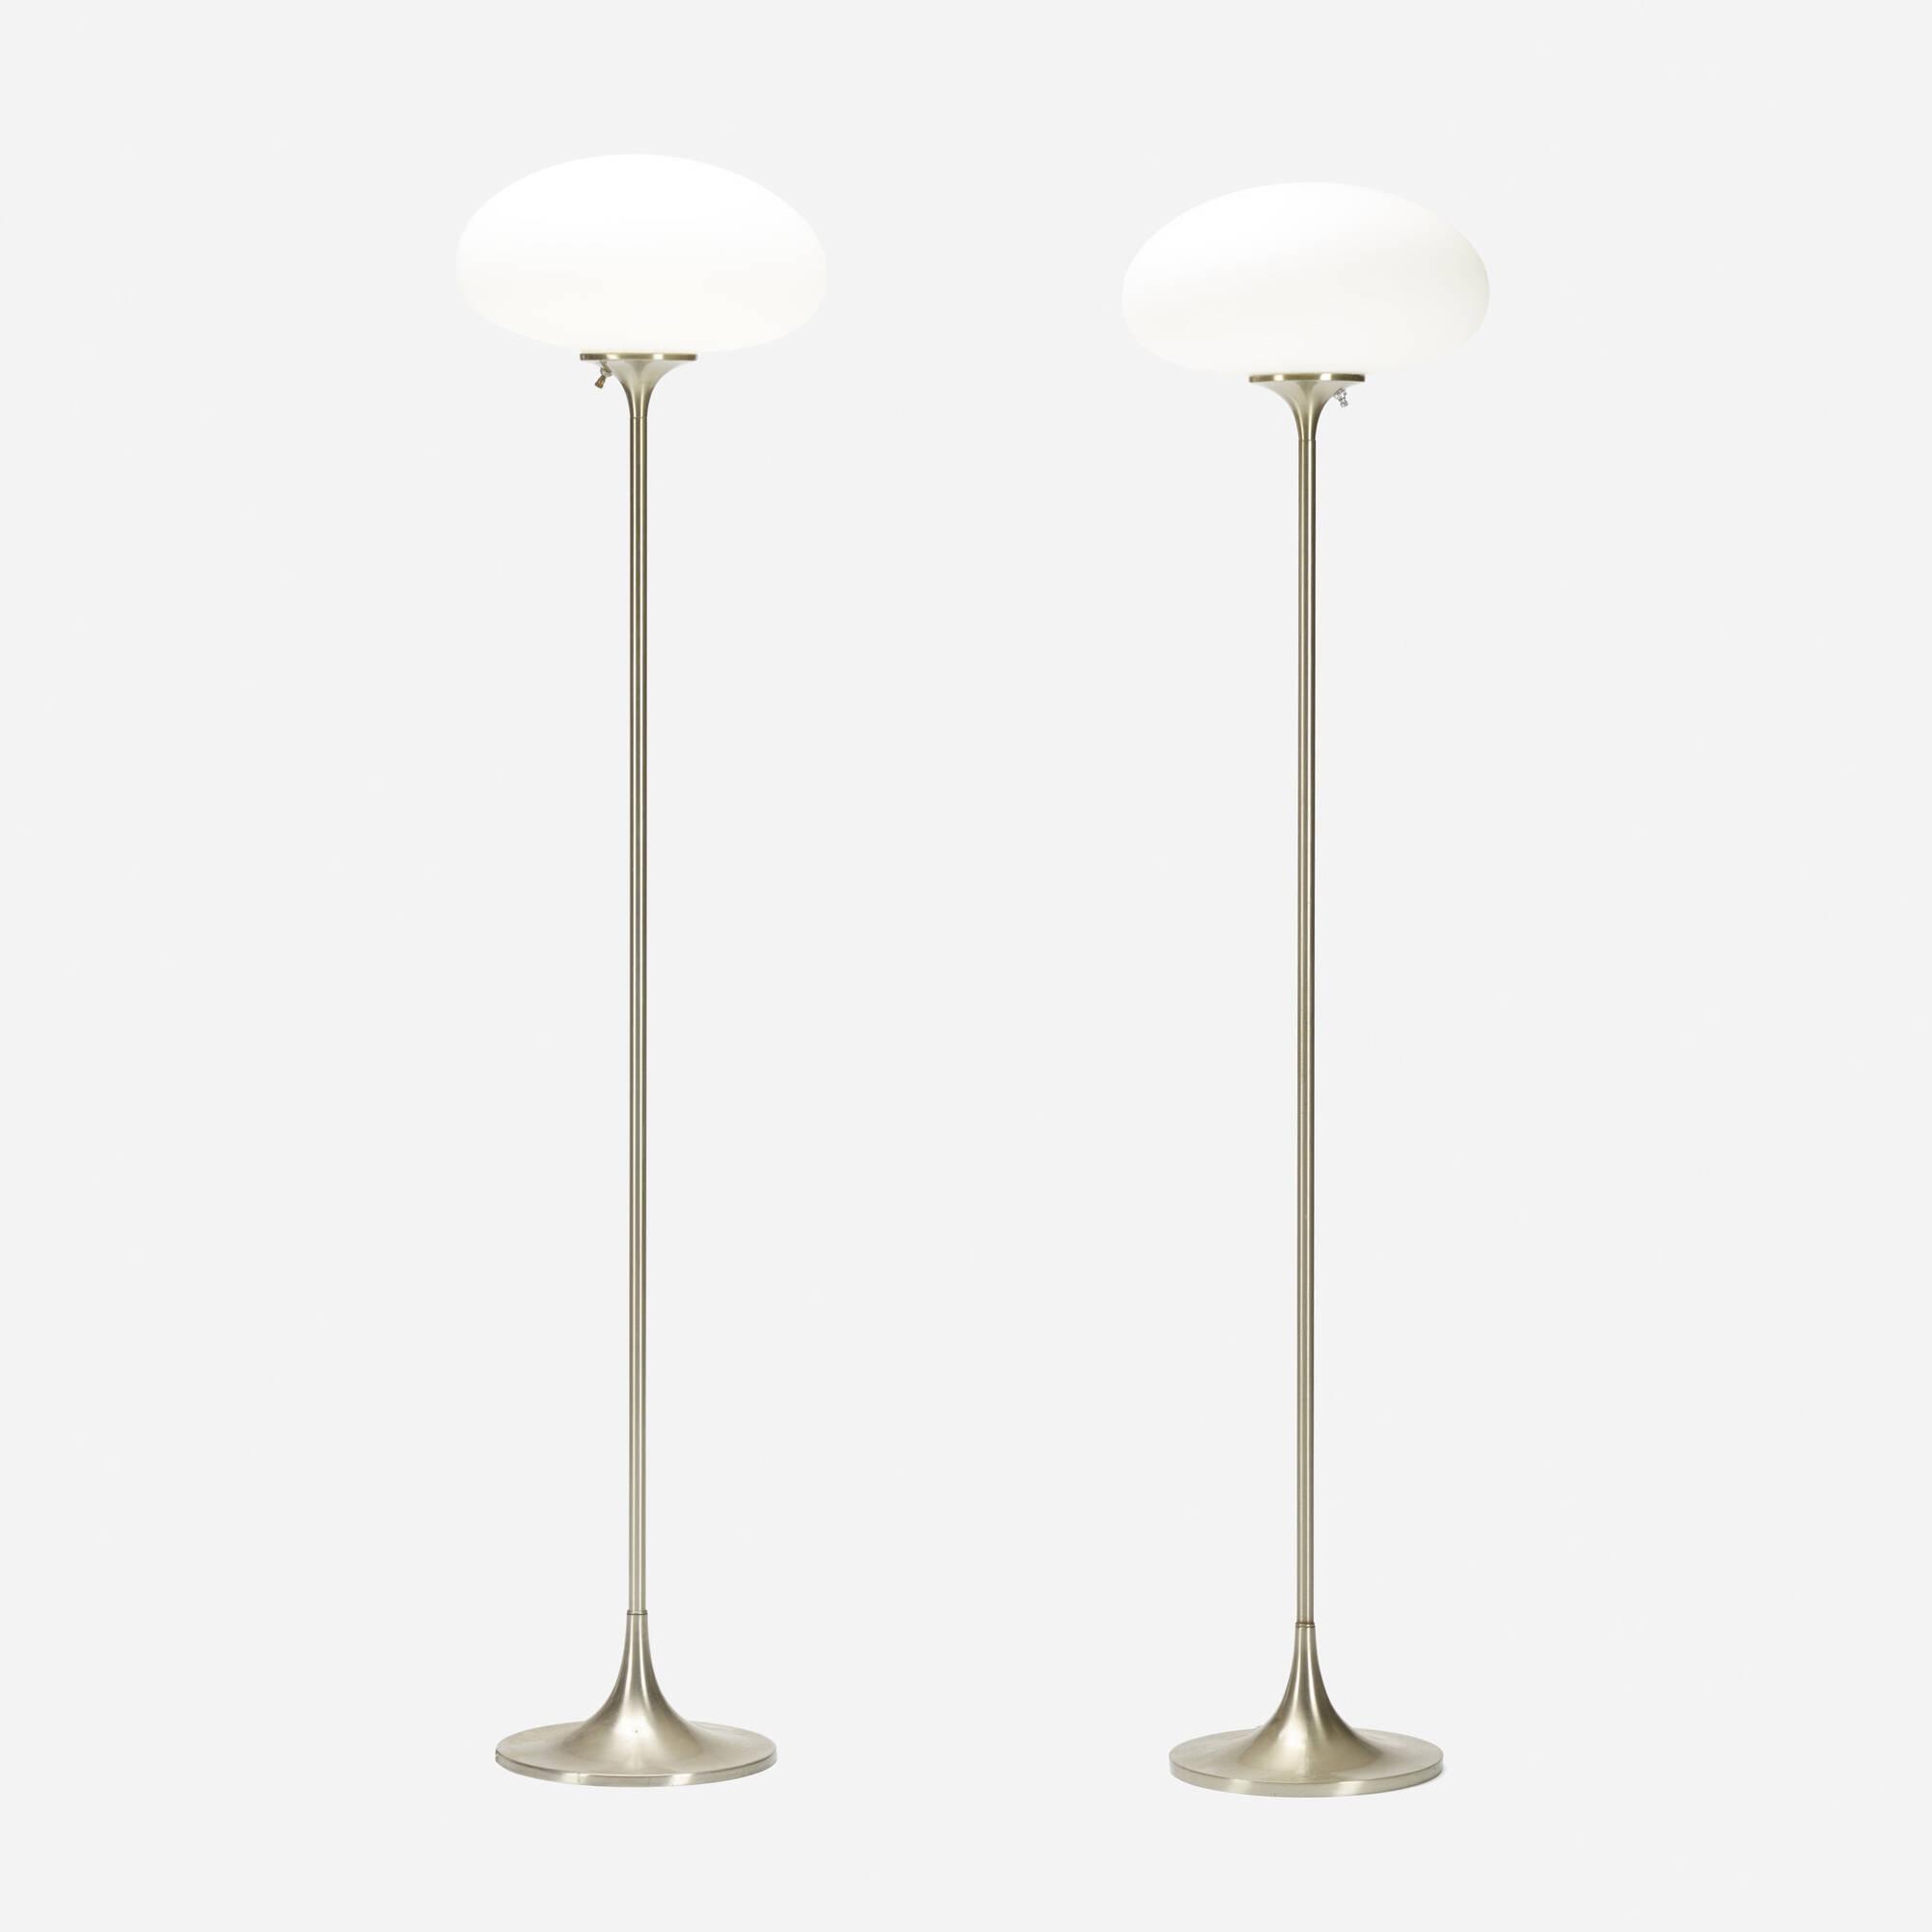 415: Laurel Lamp Co. / floor lamps, pair (1 of 1)